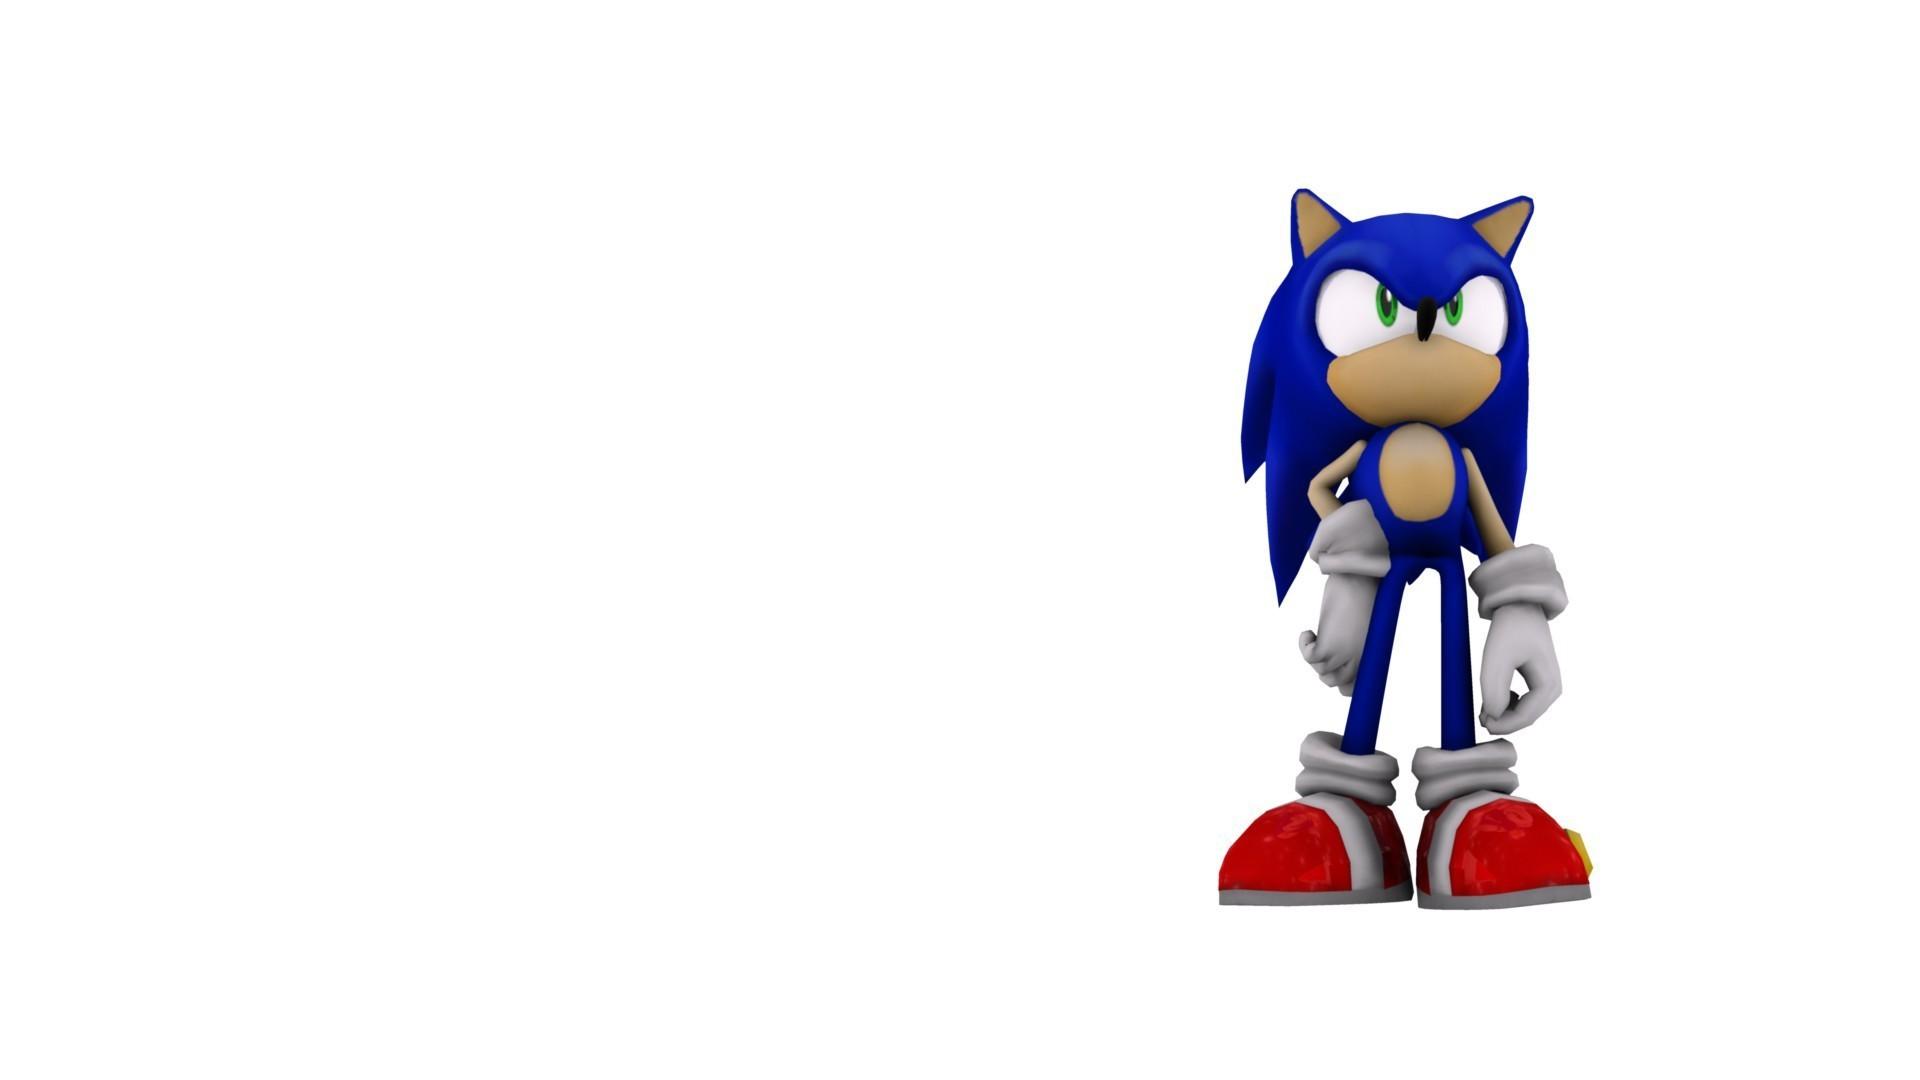 3d-sonic-the-hedgehog-twilight-wolves-1920x1080-sonic-hedgehog-twilight-wolves-via-www-allwal-wallpaper-wp3601272